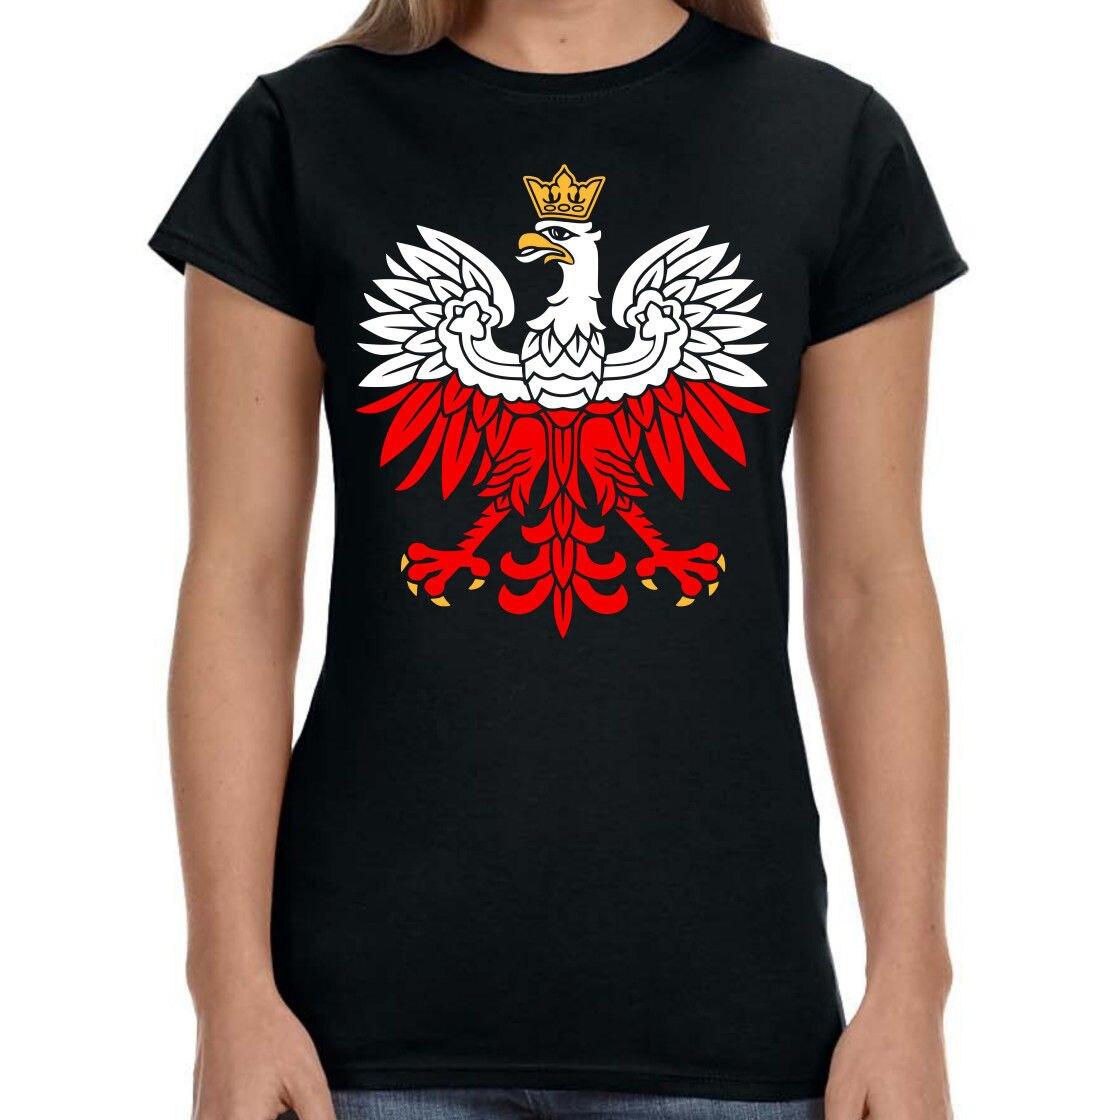 2019 Hot Sale Fashion White-Red Patriotic T-shirt Poland Eagle Polish Patriotic T Shirt Tee Shirt